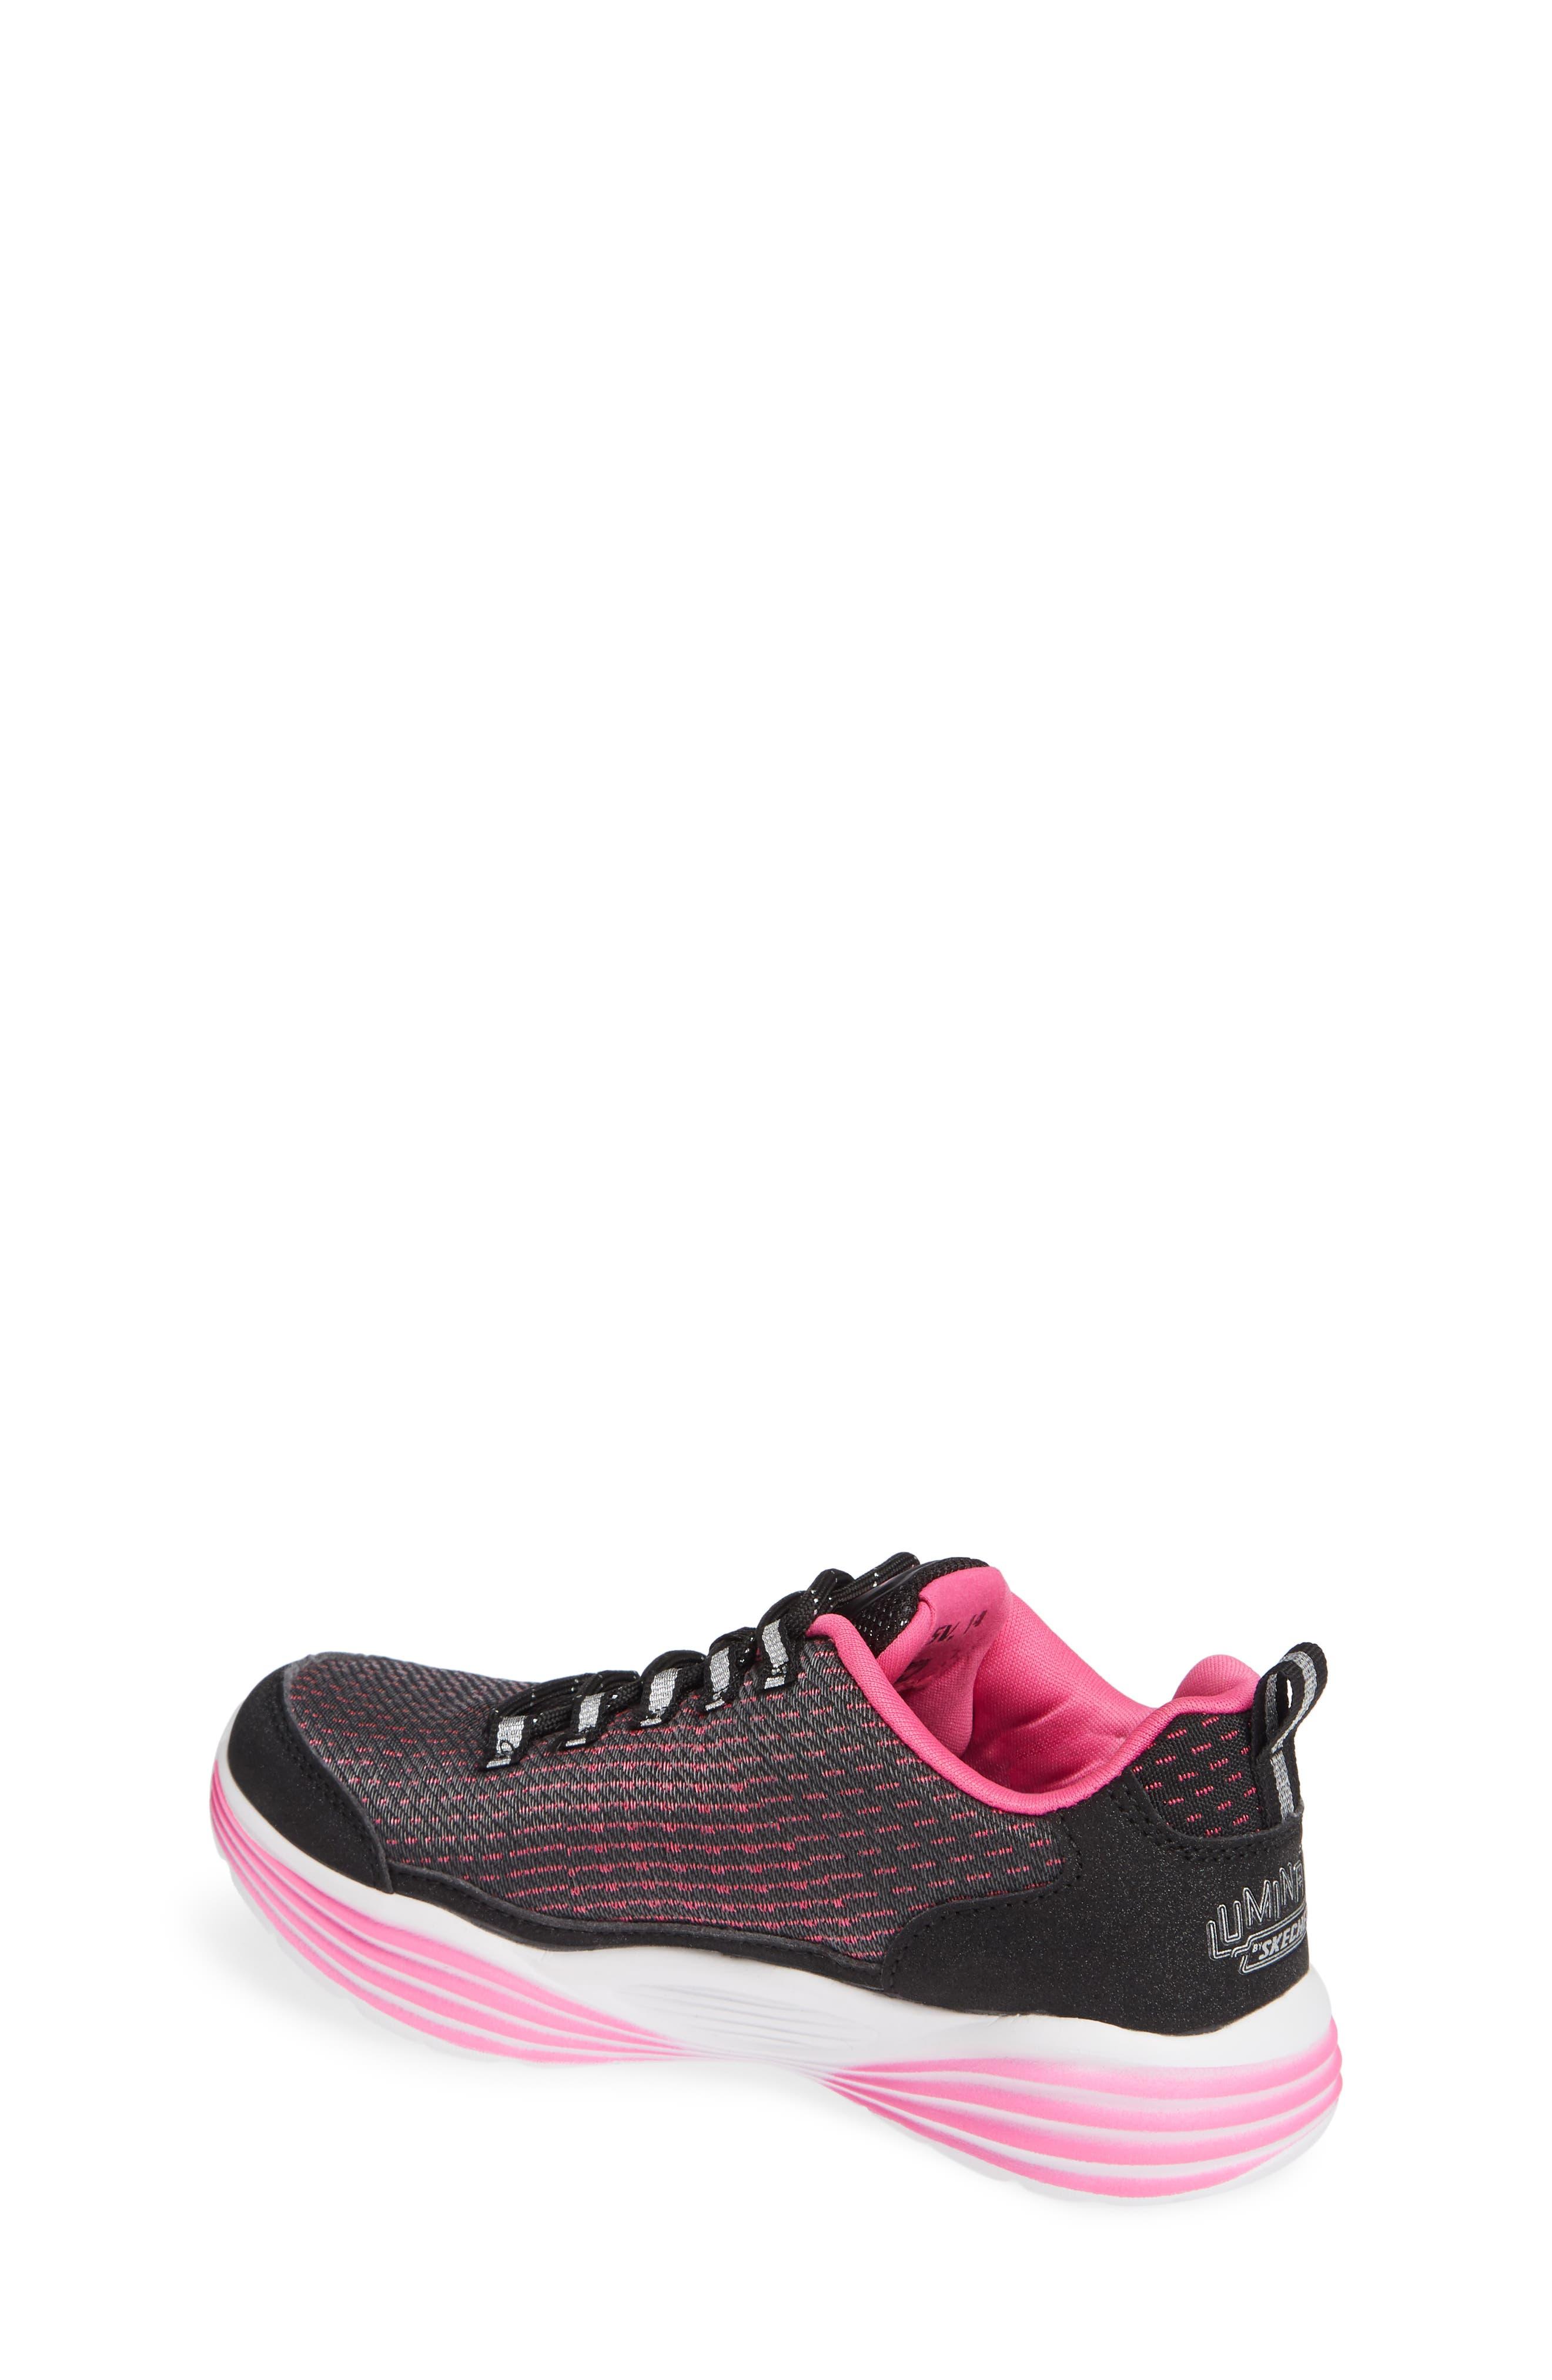 Luminator Light Up Sneaker,                             Alternate thumbnail 2, color,                             BLACK/ PINK